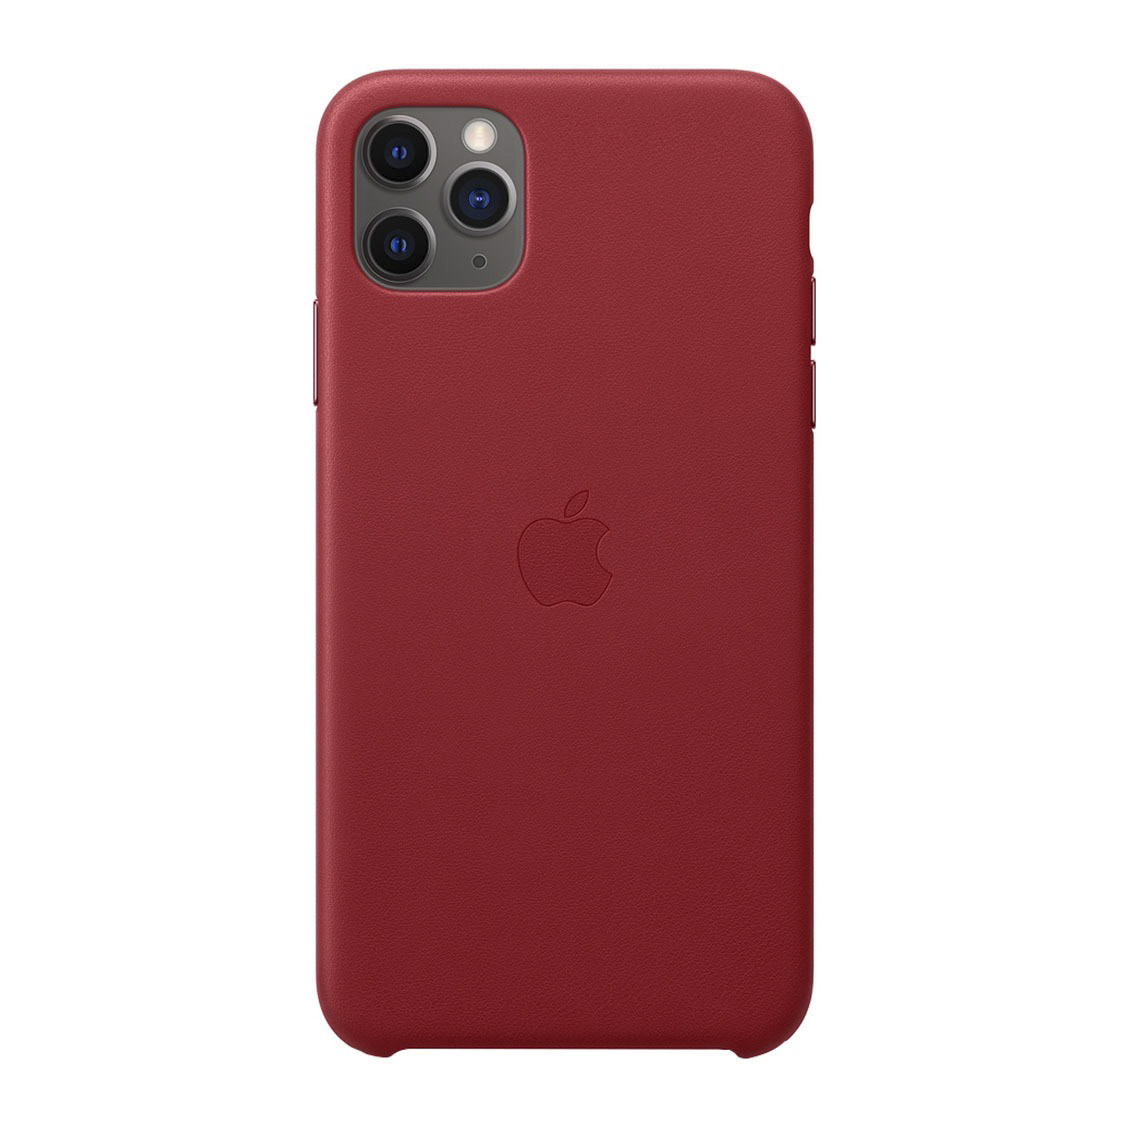 Чехол для смартфона Apple iPhone 11 Pro Leather Case, красный фото